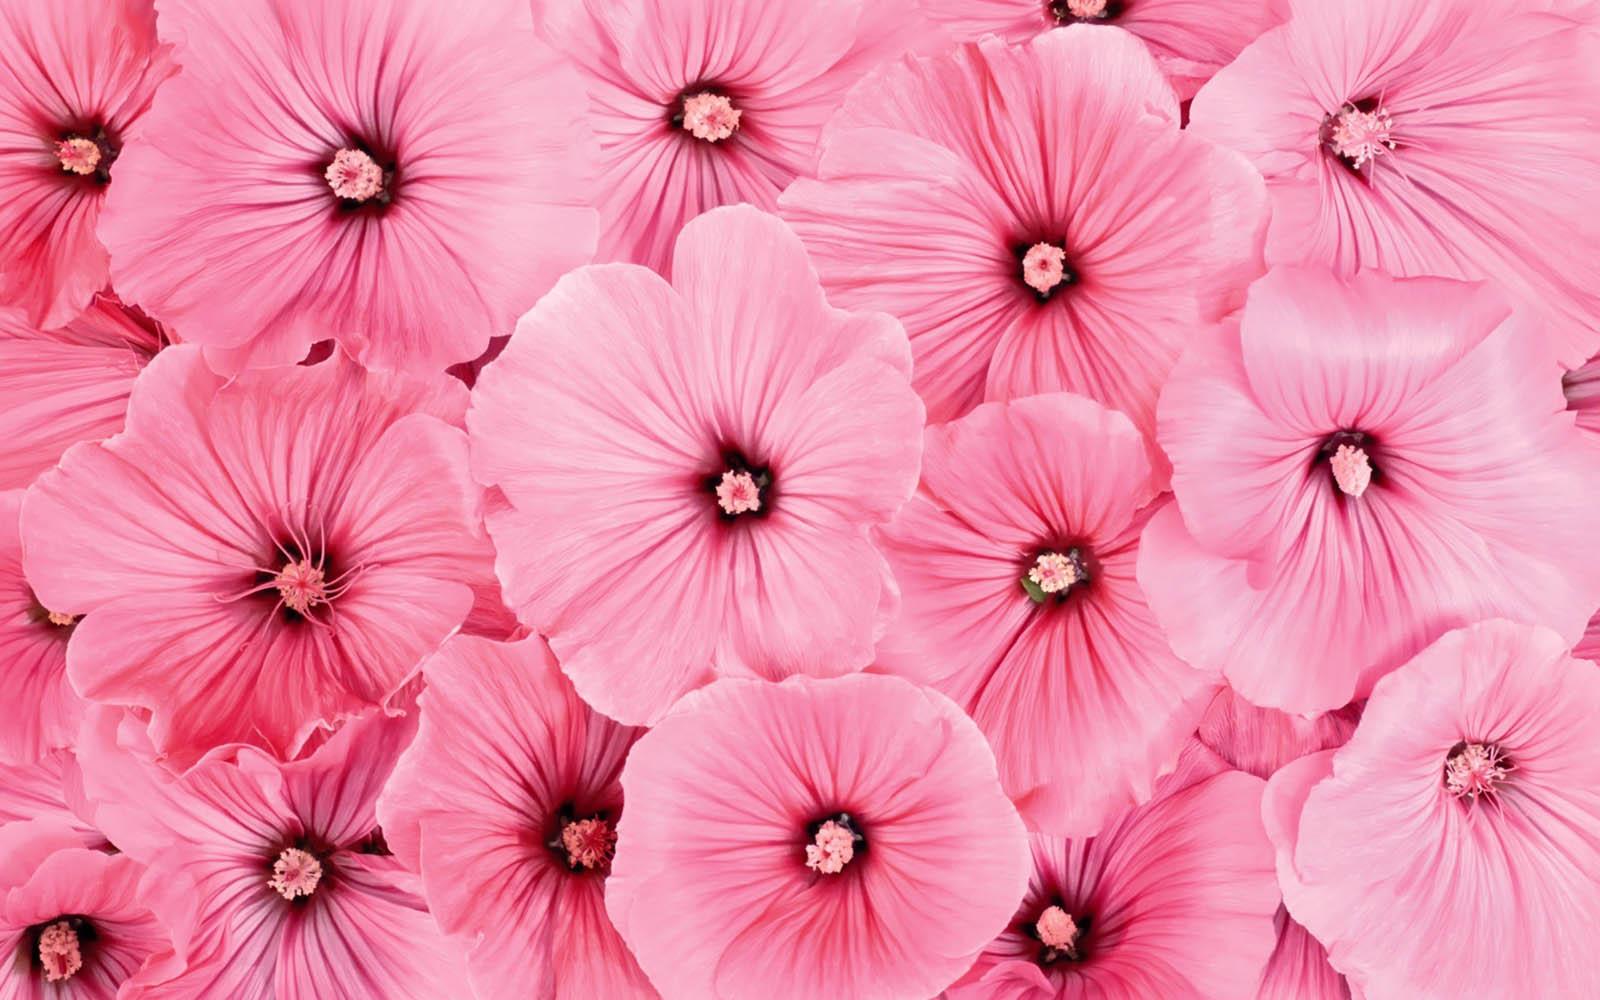 Wallpapers PinkFlowers Desktop Wallpapers Pink Flowers Desktop 1600x1000